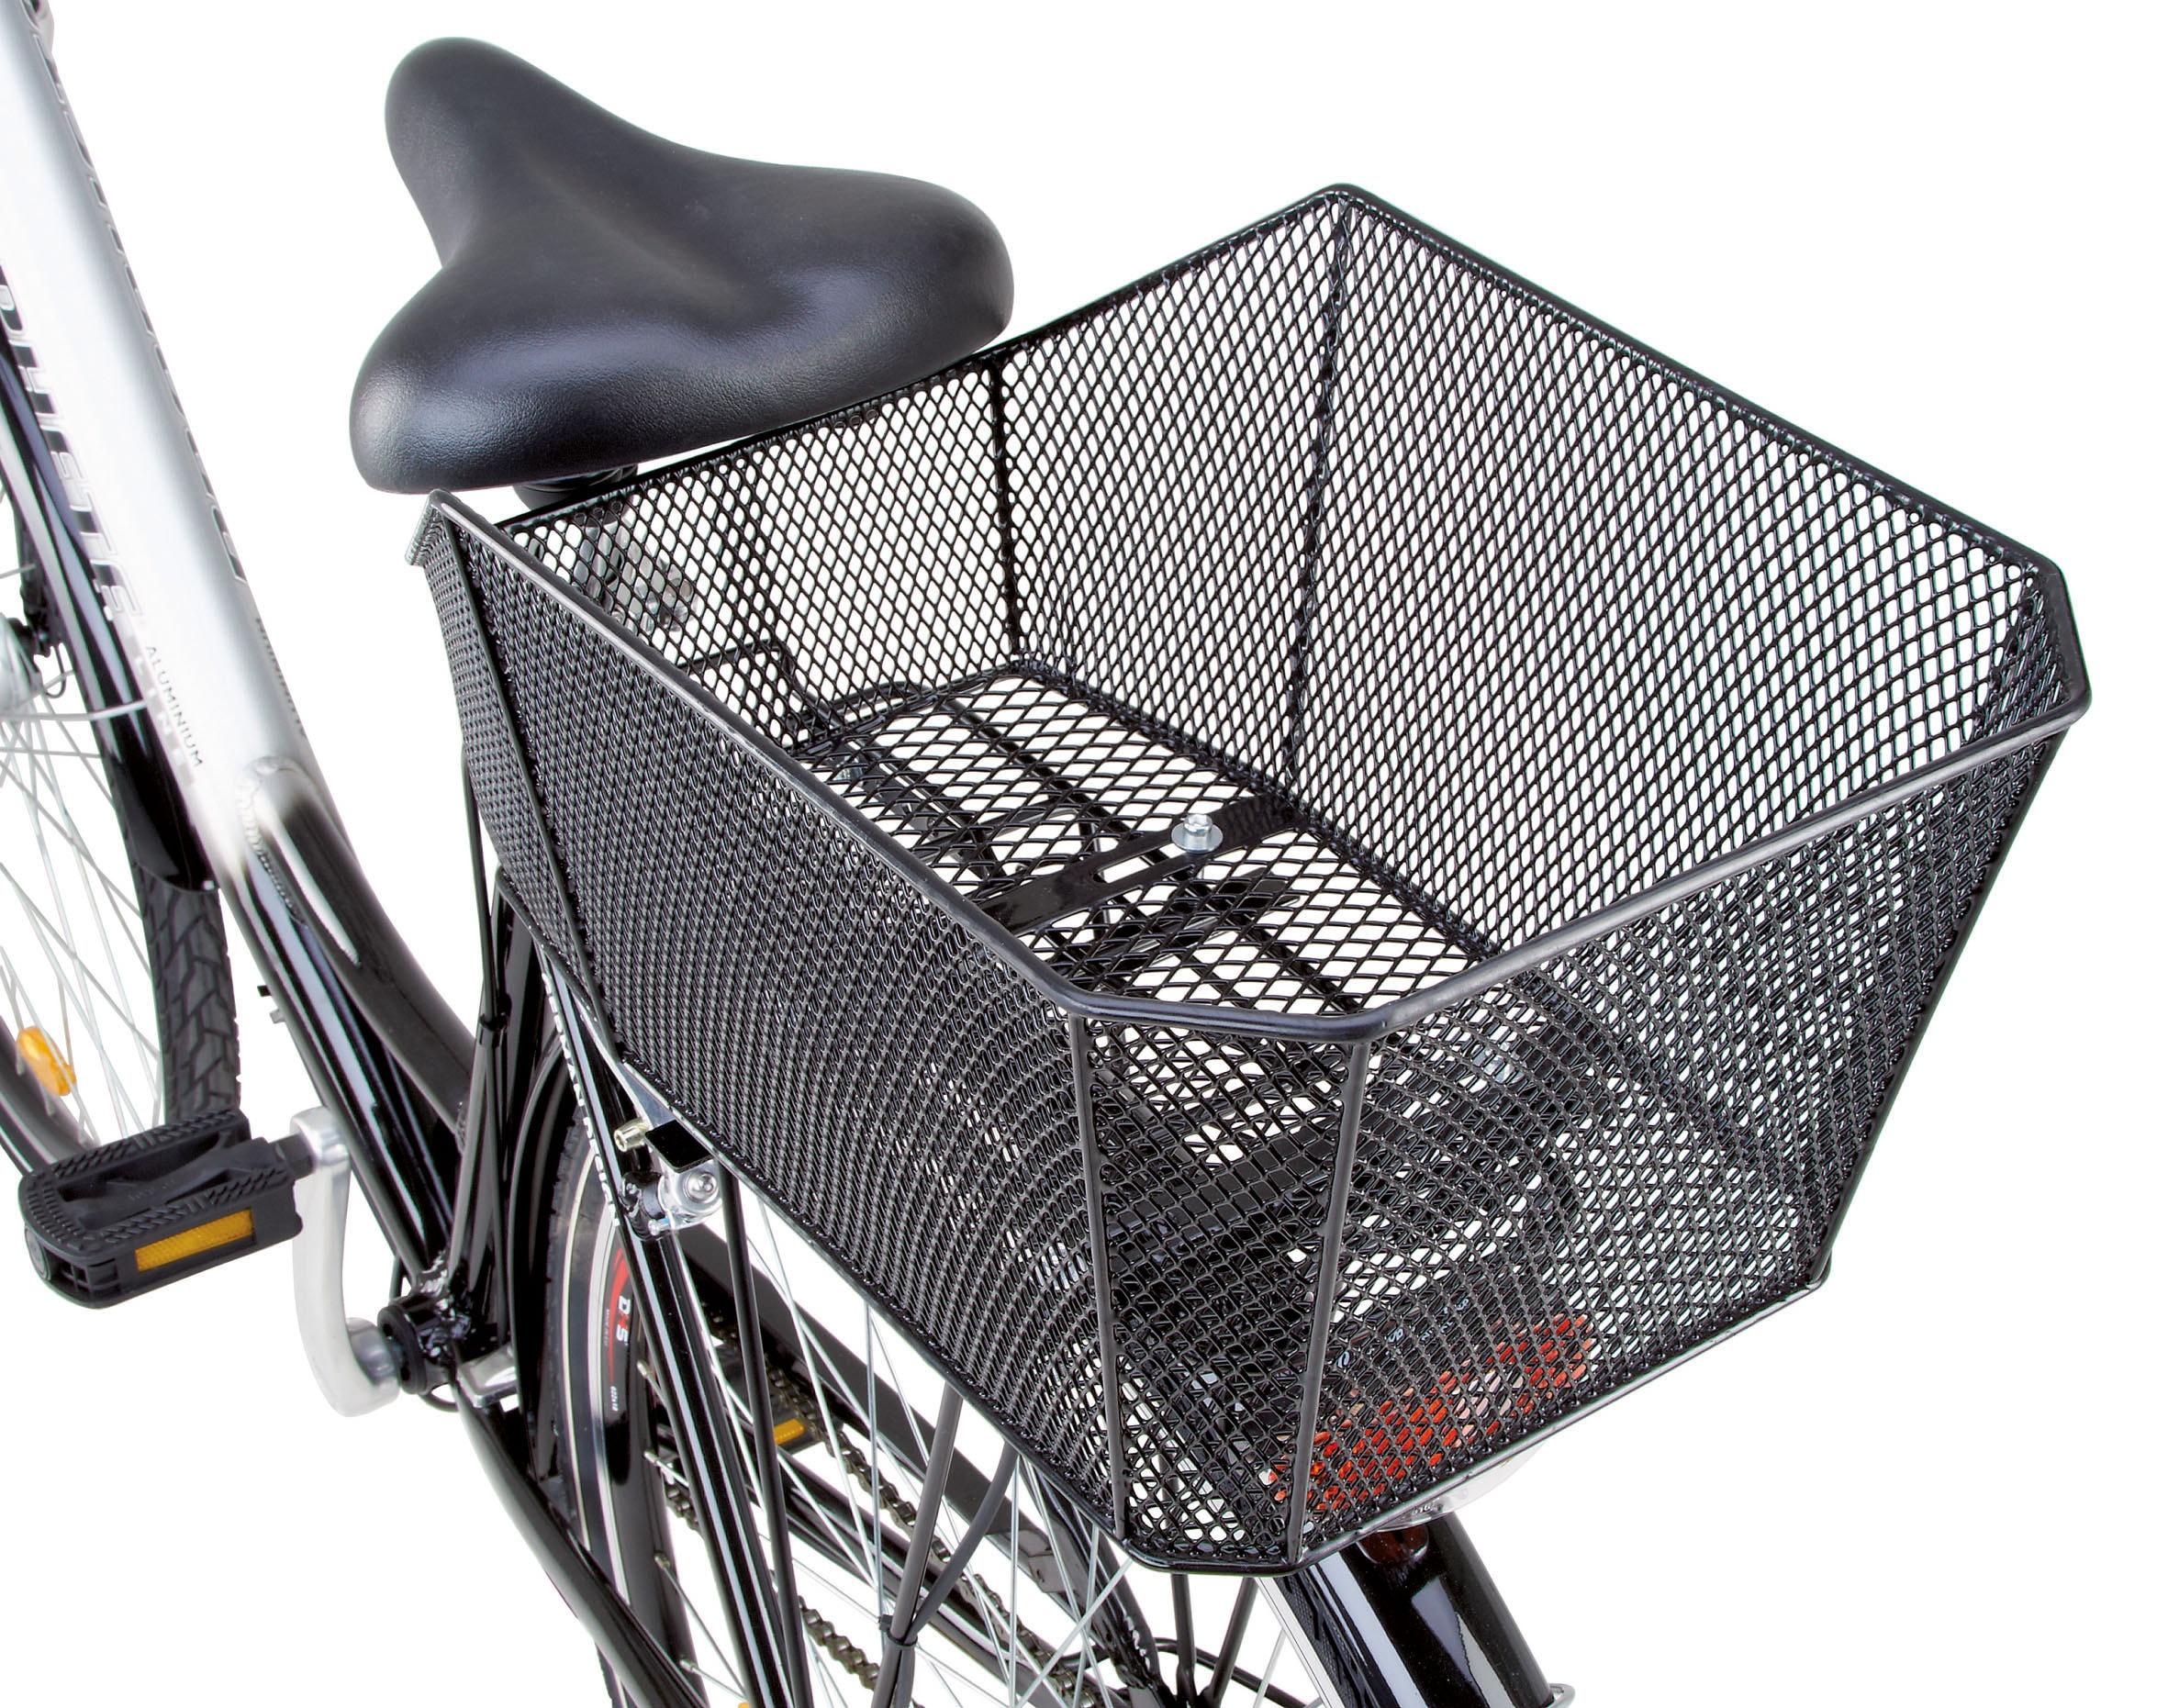 Prophete Fahrradkorb Technik & Freizeit/Sport & Freizeit/Fahrräder & Zubehör/Fahrradzubehör/Fahrradkörbe